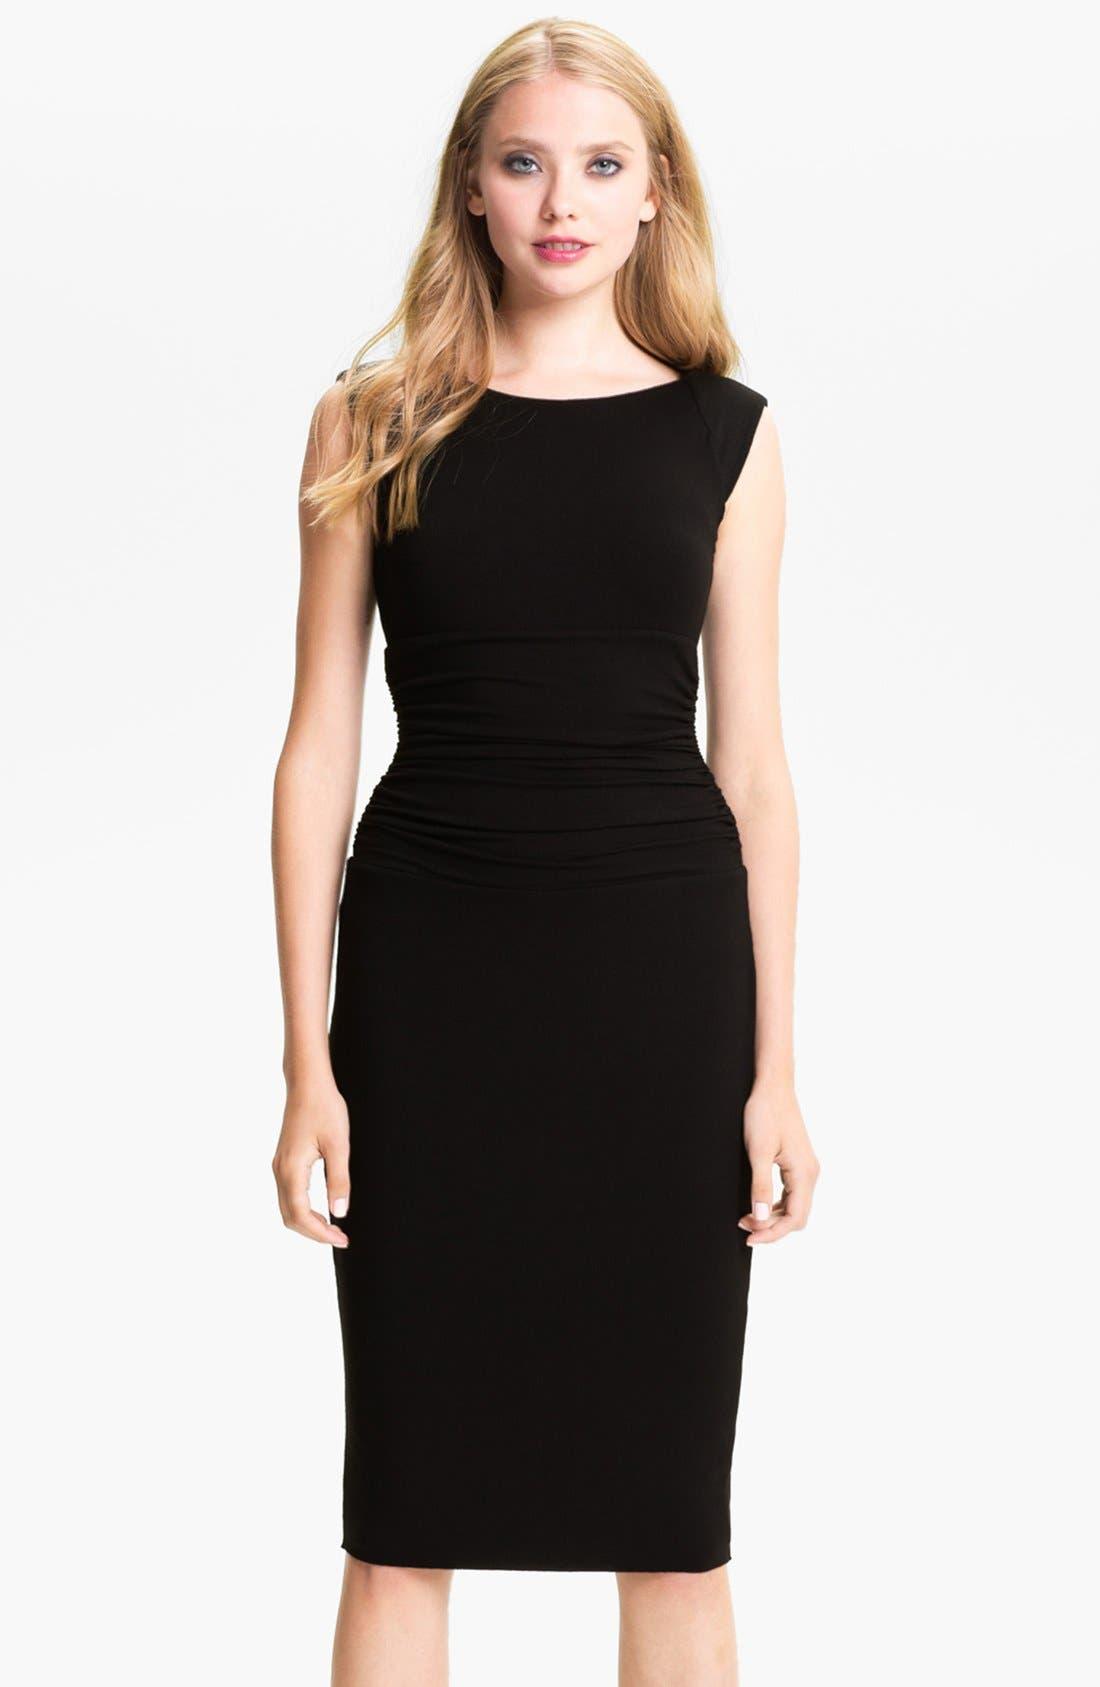 Ruched Cap Sleeve Sheath Dress,                             Main thumbnail 1, color,                             001